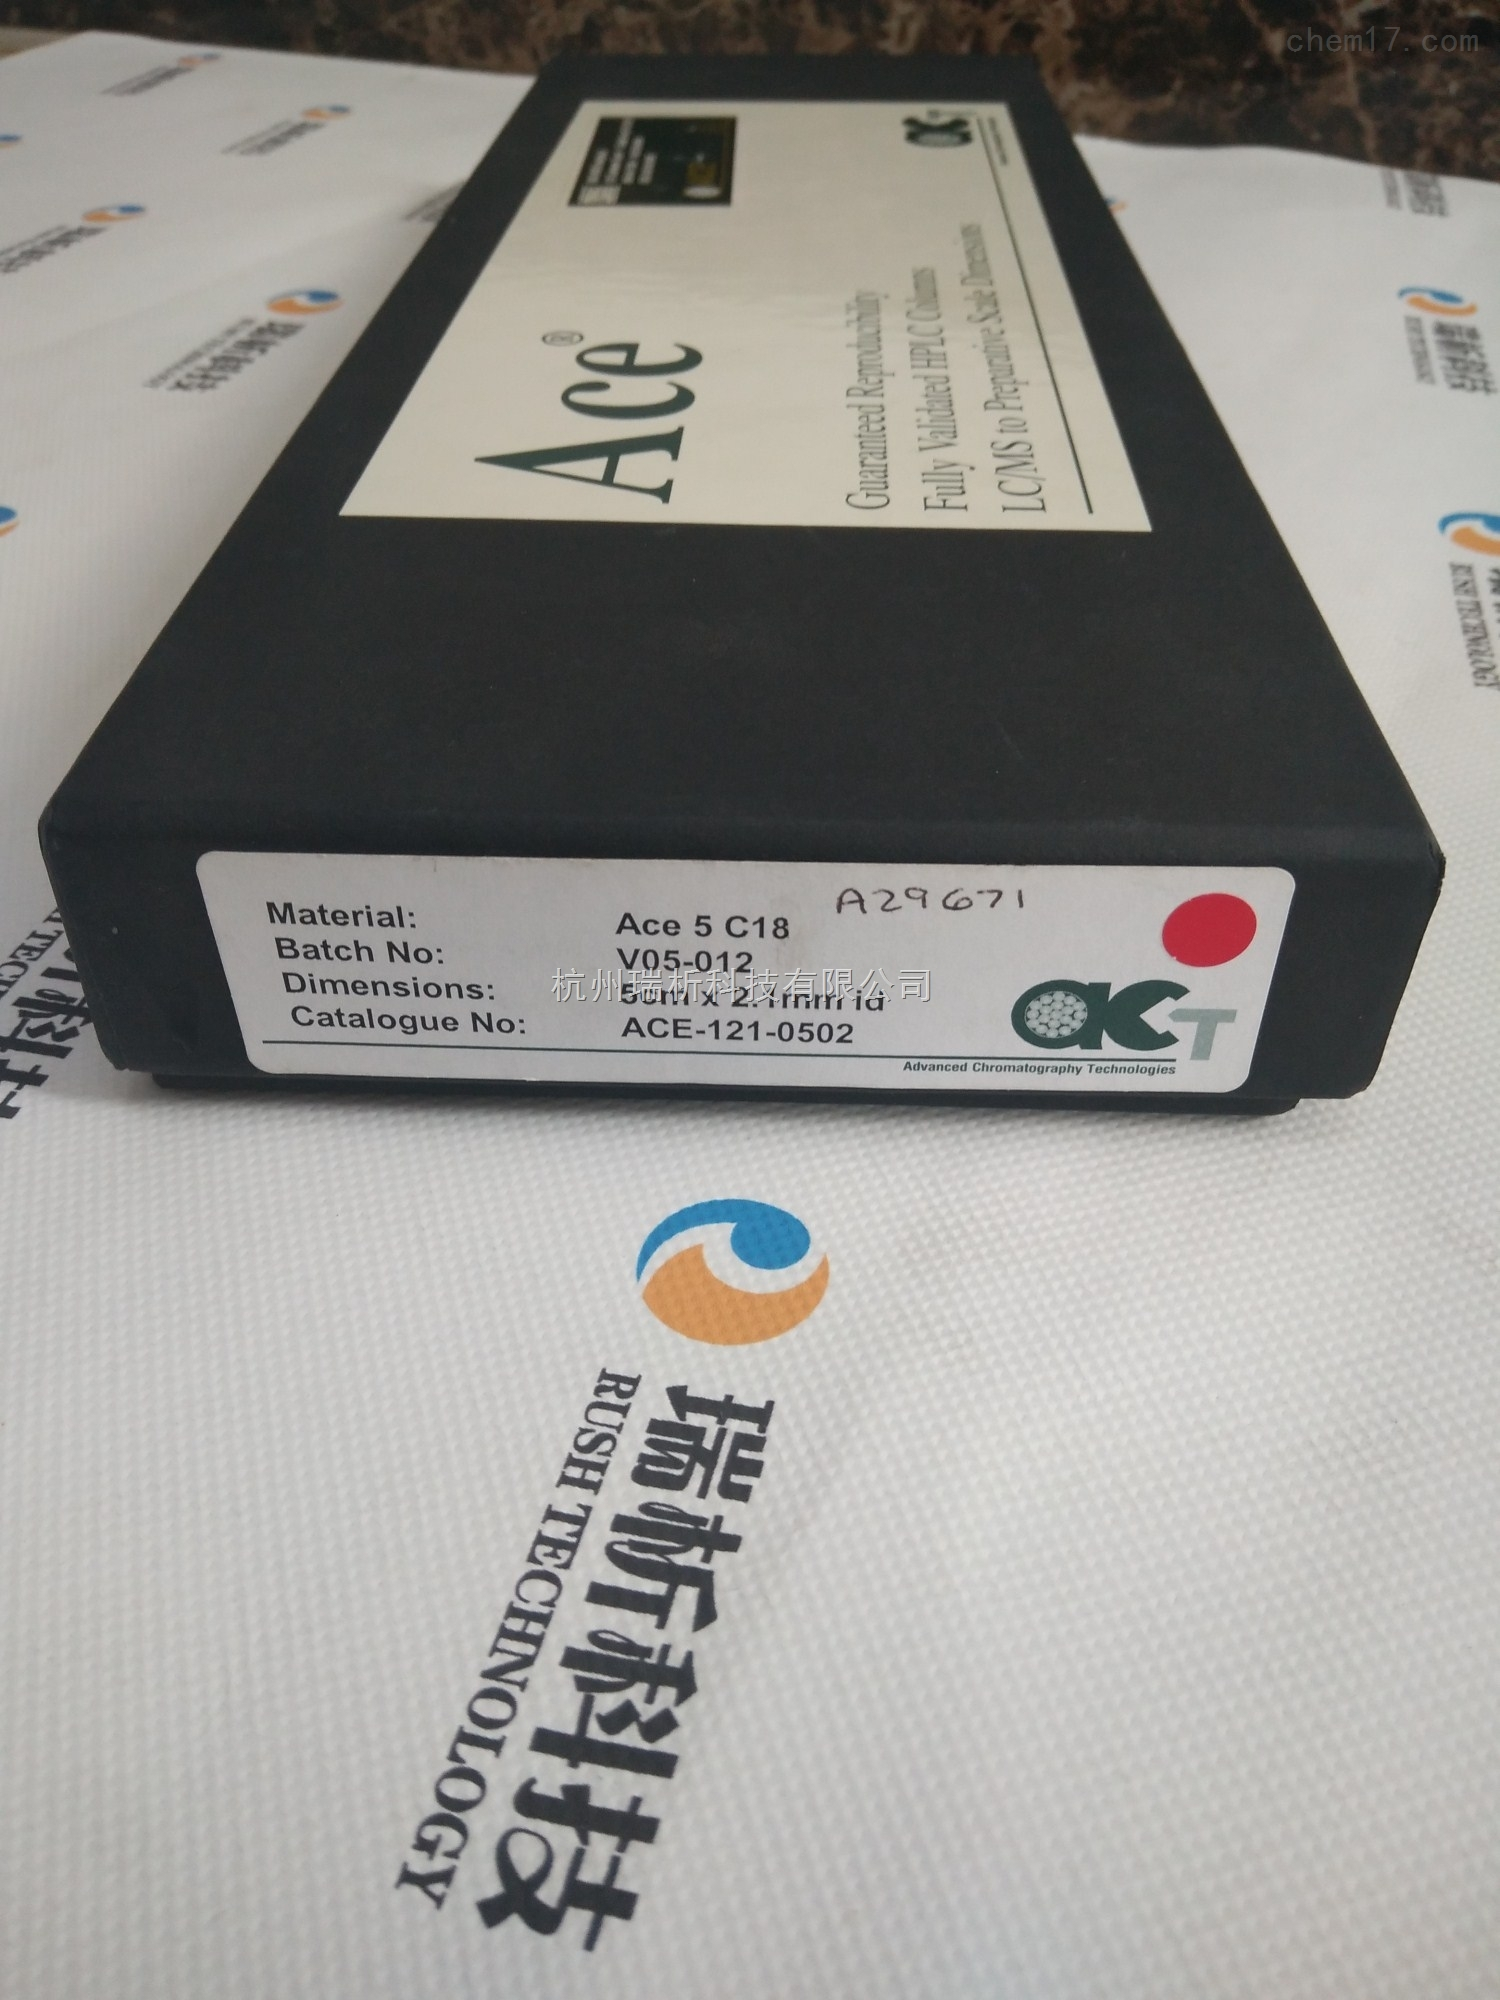 ace-121-0502色谱柱液相色谱柱material  catalogue  no   ace-121-0502